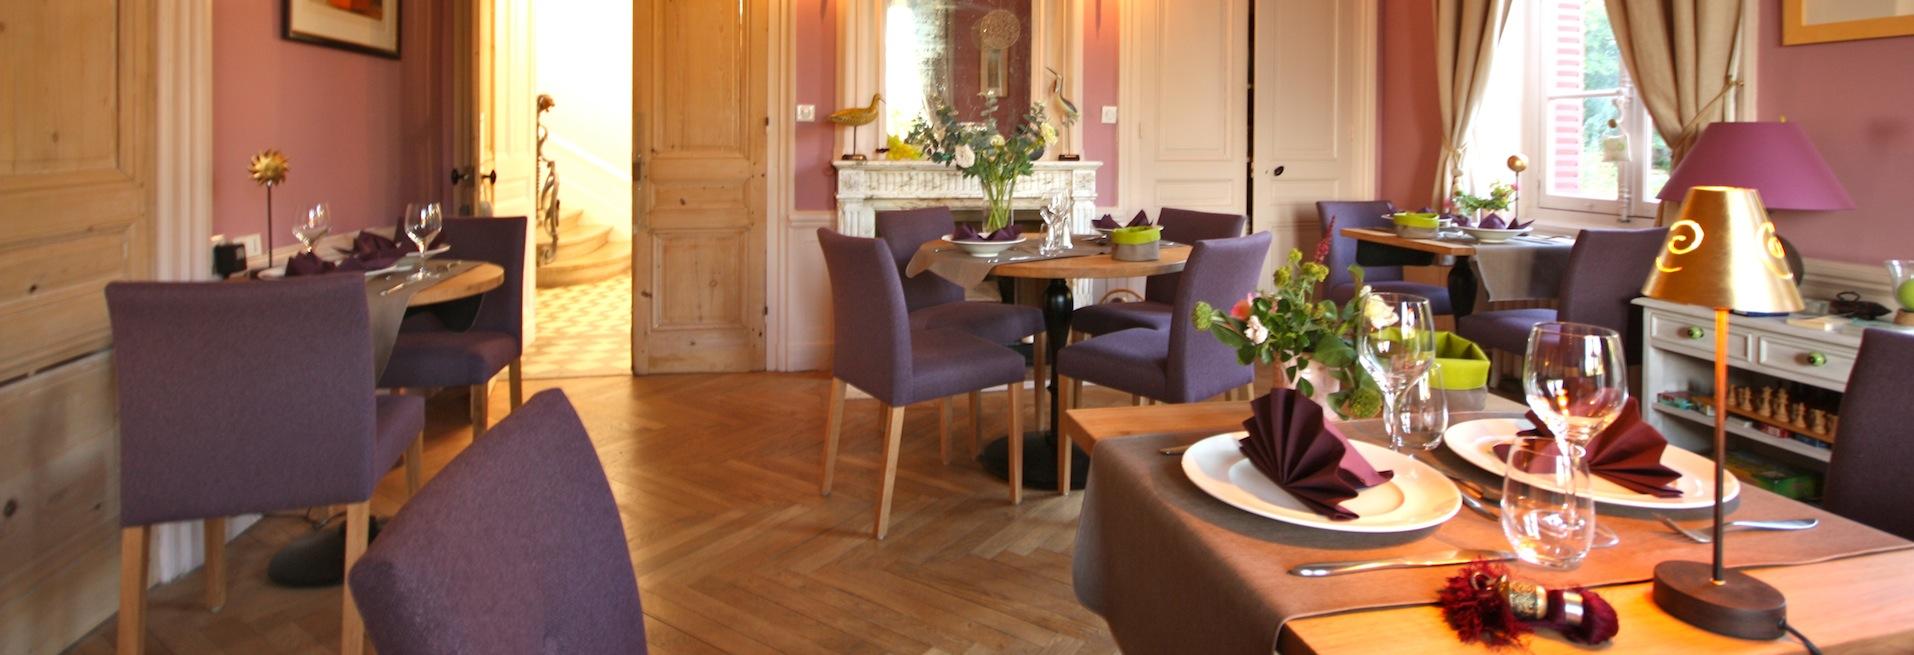 restaurant gastronomique lyon la source dor e. Black Bedroom Furniture Sets. Home Design Ideas